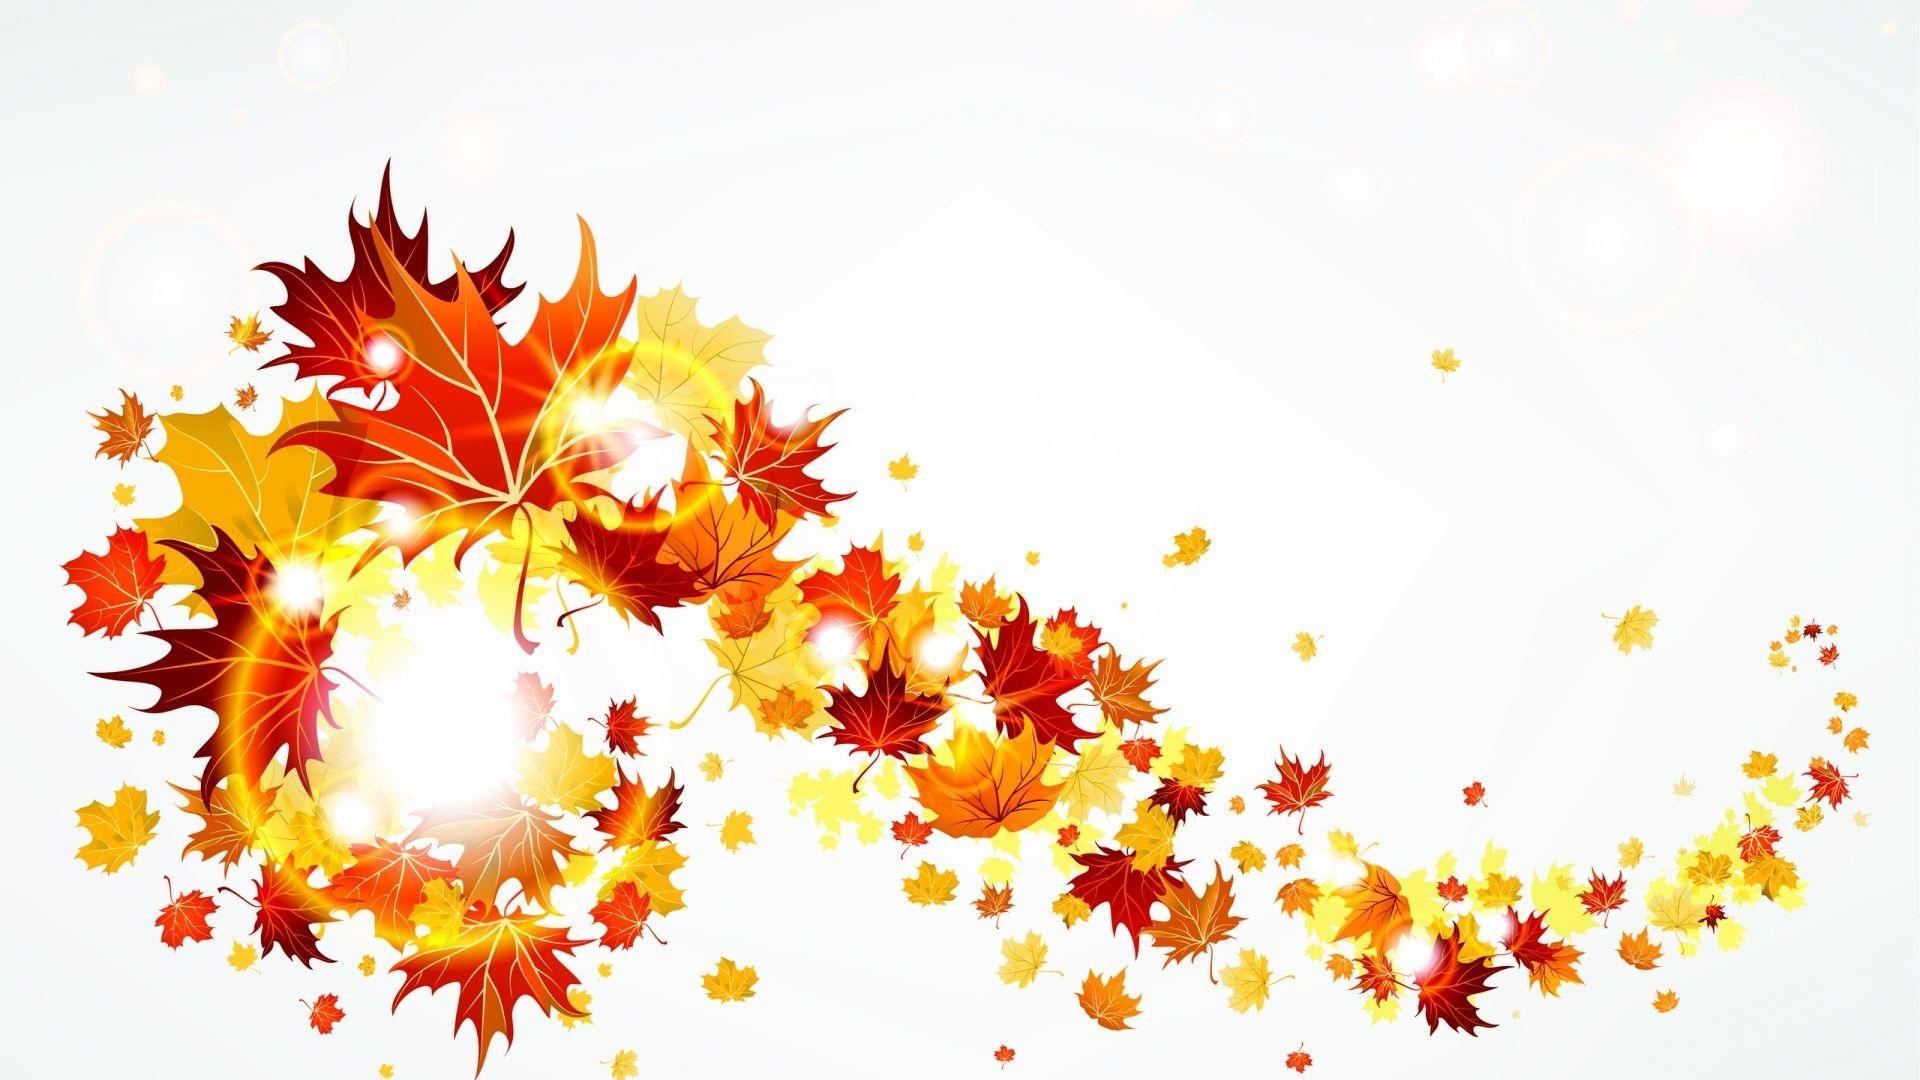 Autumn leaves borders clipart graphic transparent Best HD Fall Leaf Border Clip Art Image » Vector Images Design graphic transparent